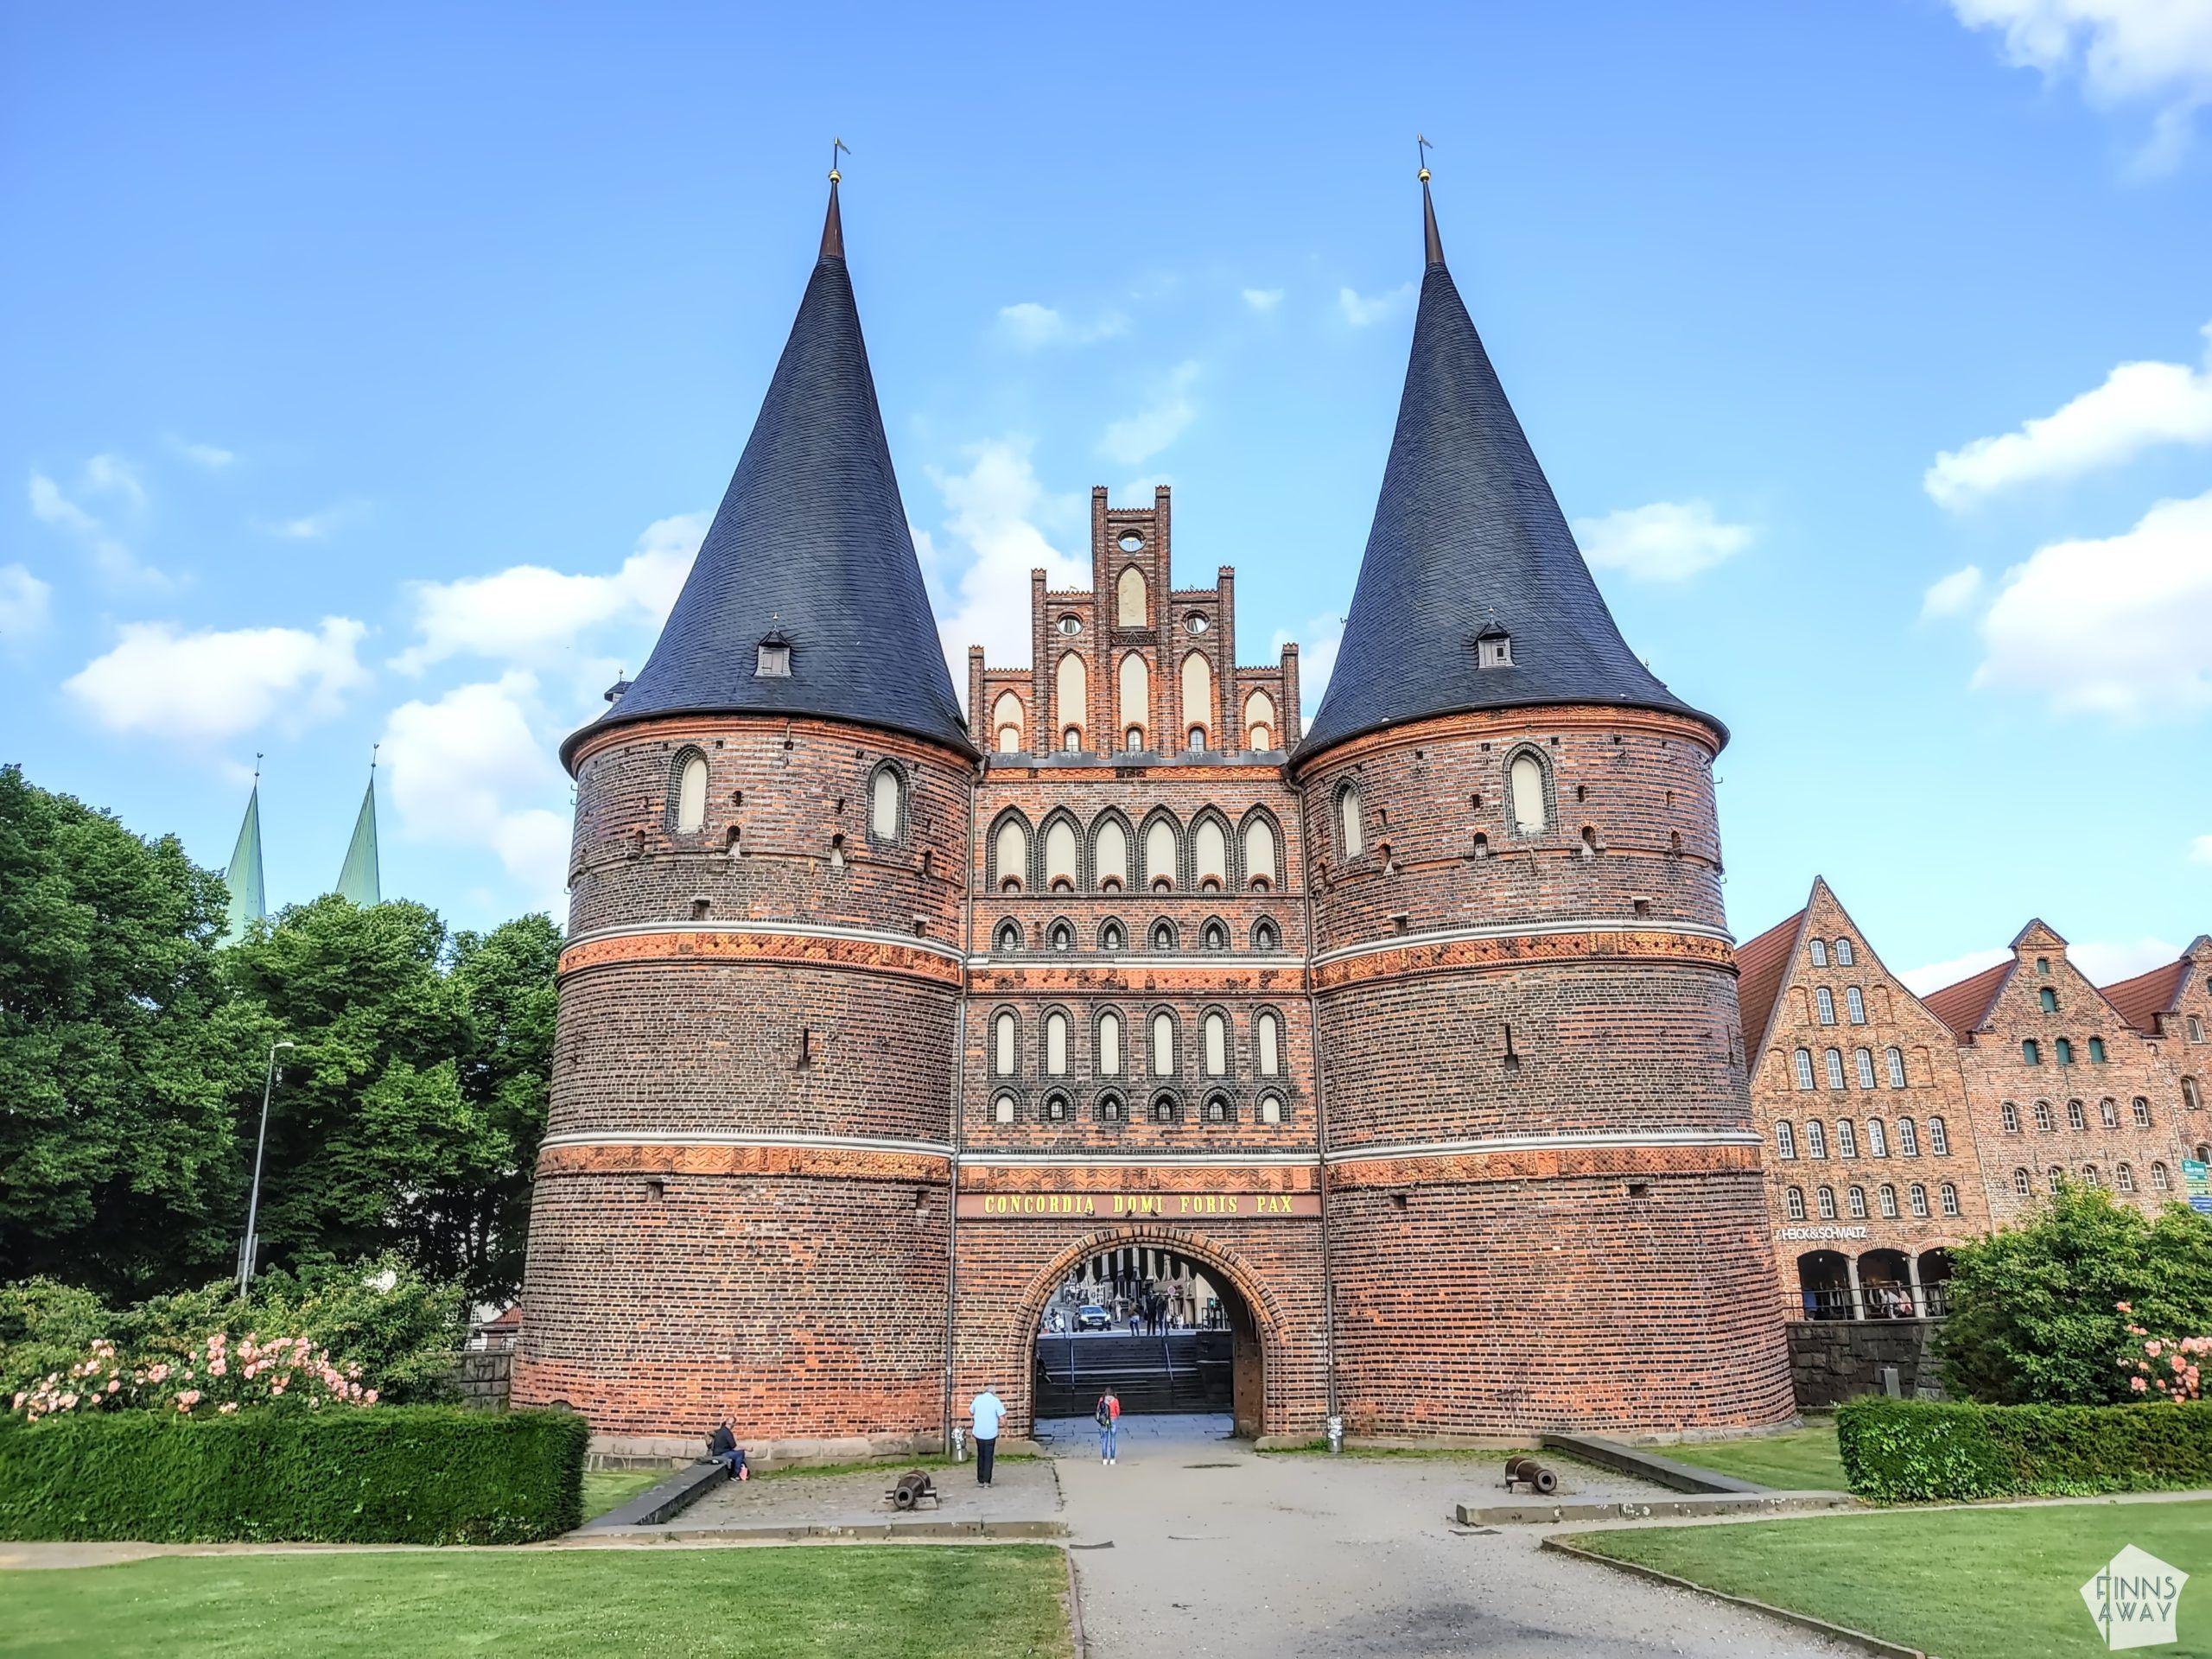 Holstentor gate   Postcards from Lübeck, Germany   FinnsAway Travel Blog